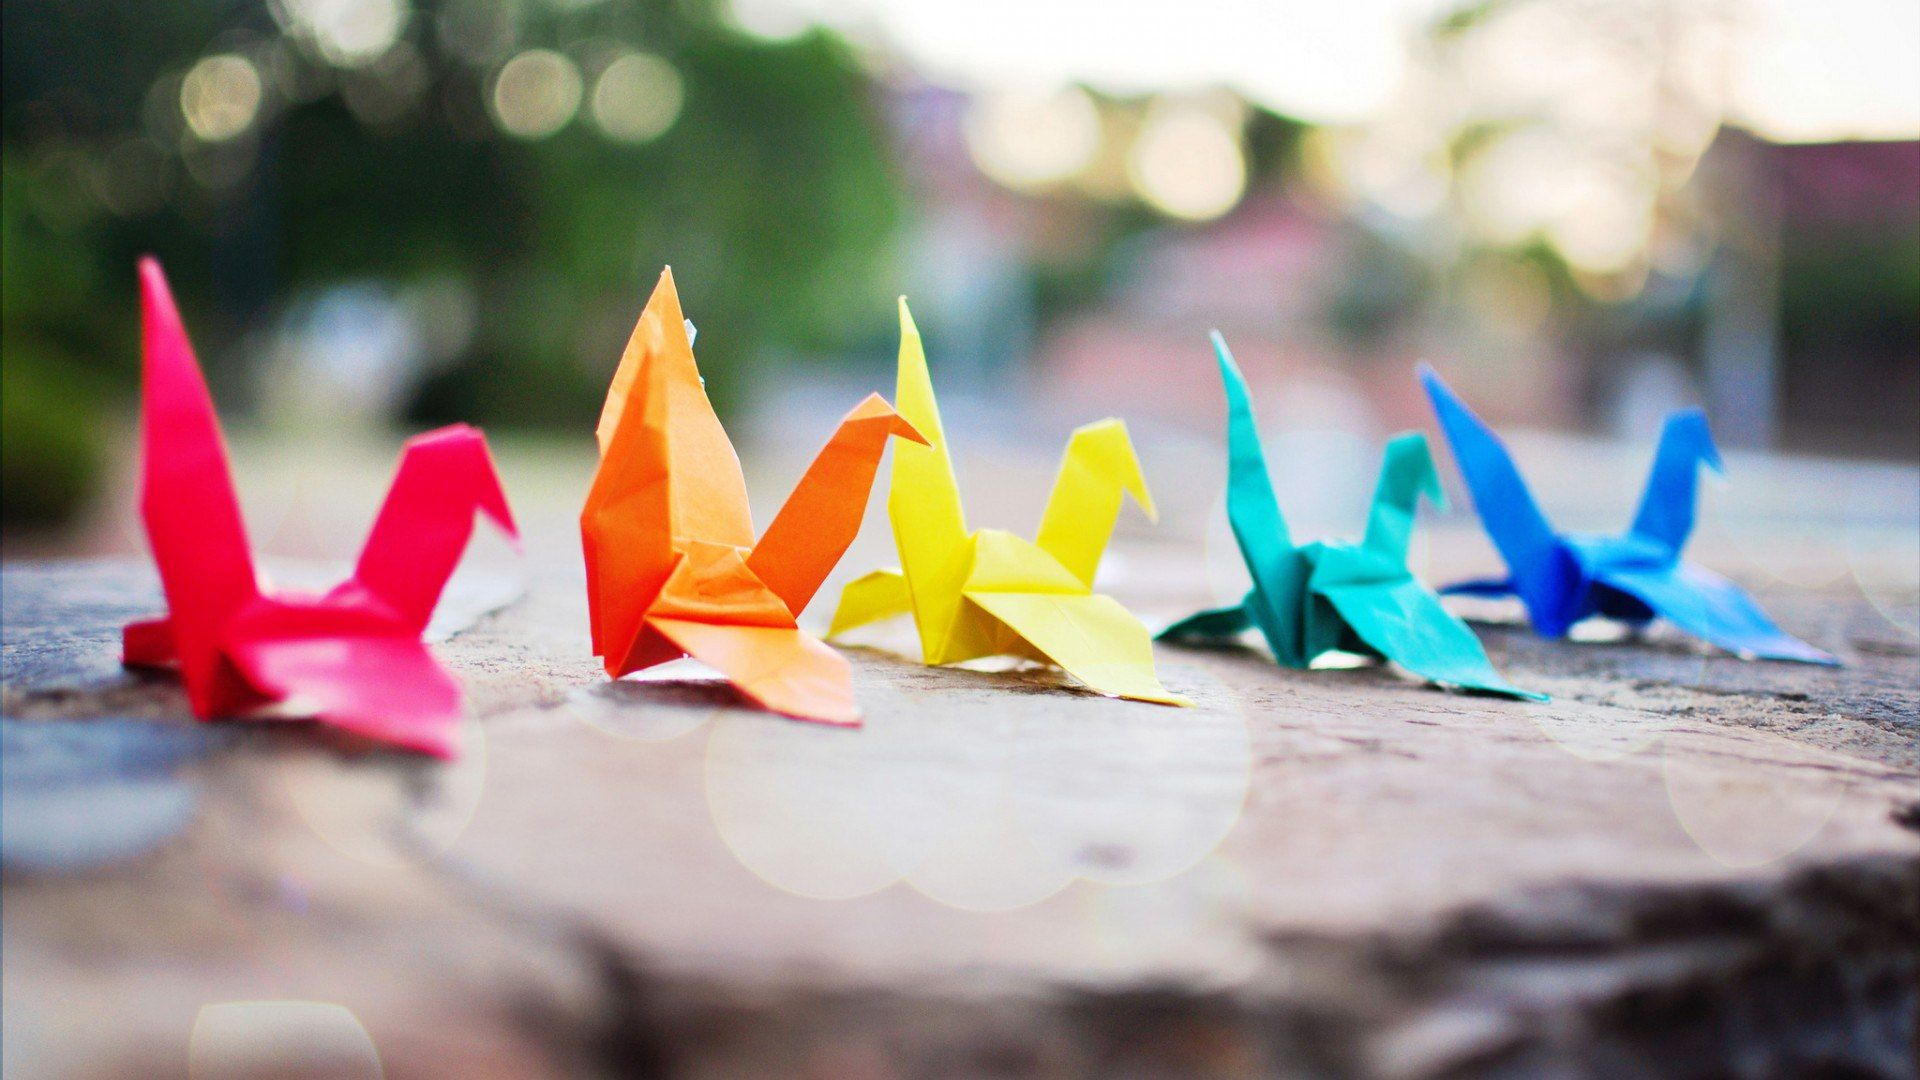 Origami wallpaper hd